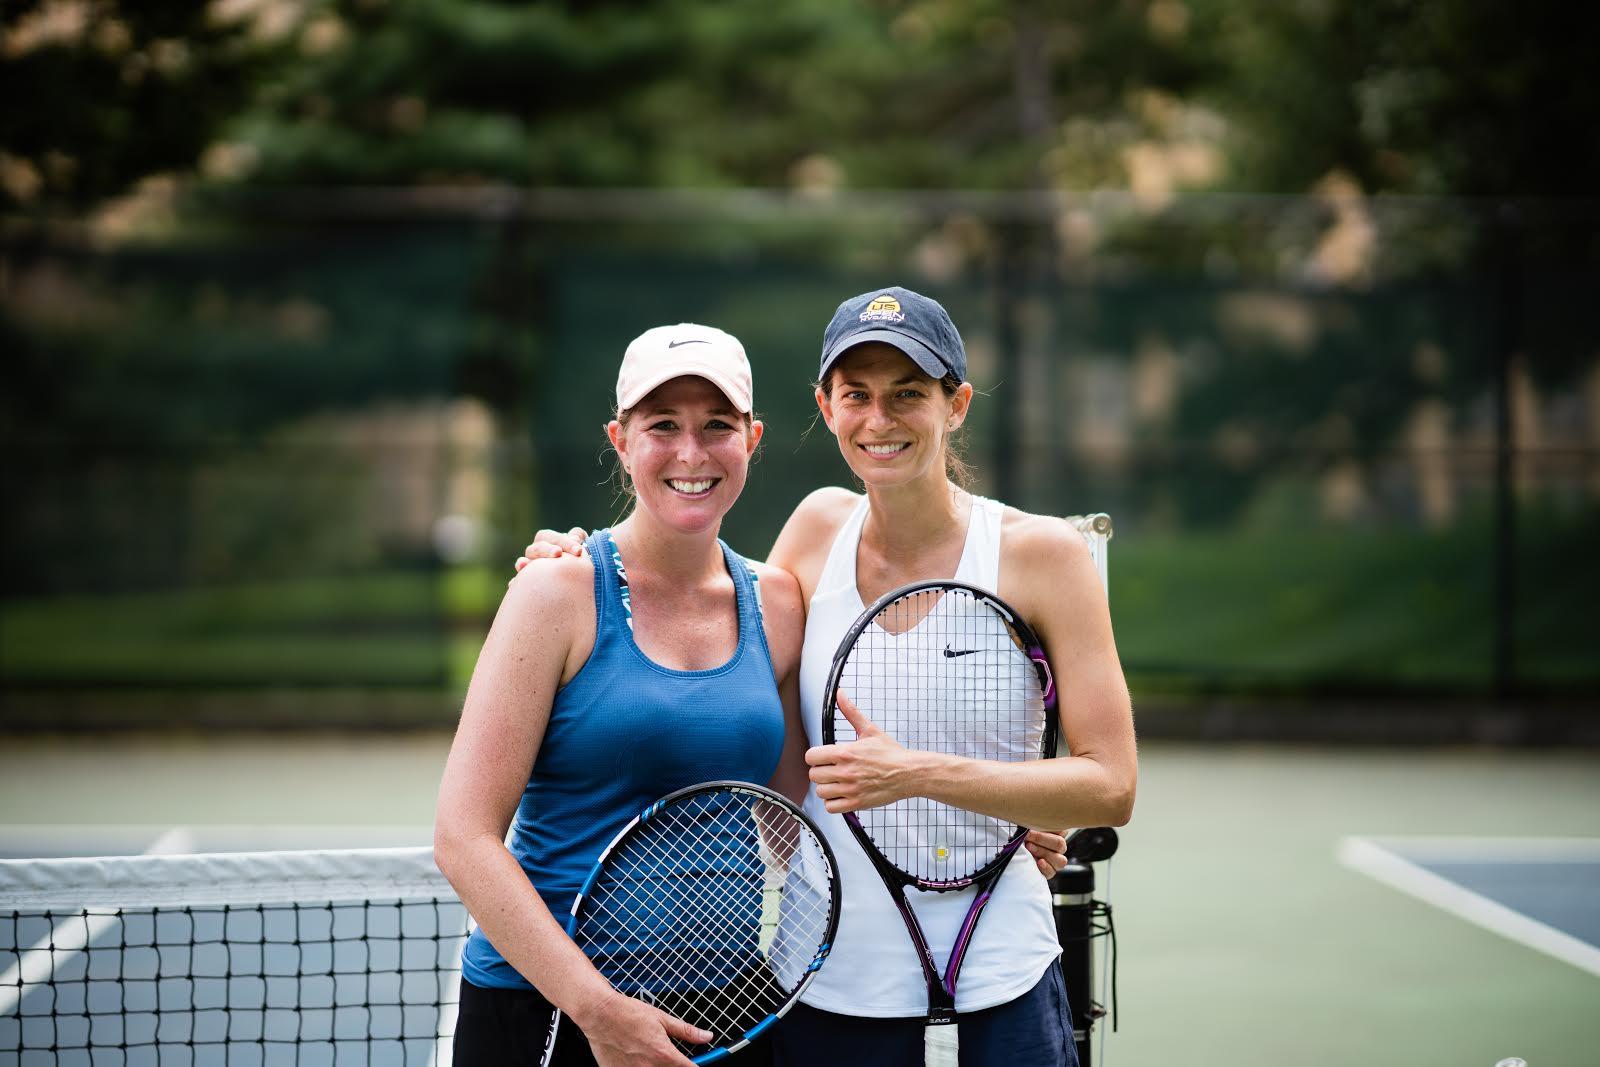 Women's singles finalists. Photo credit Duy Tran